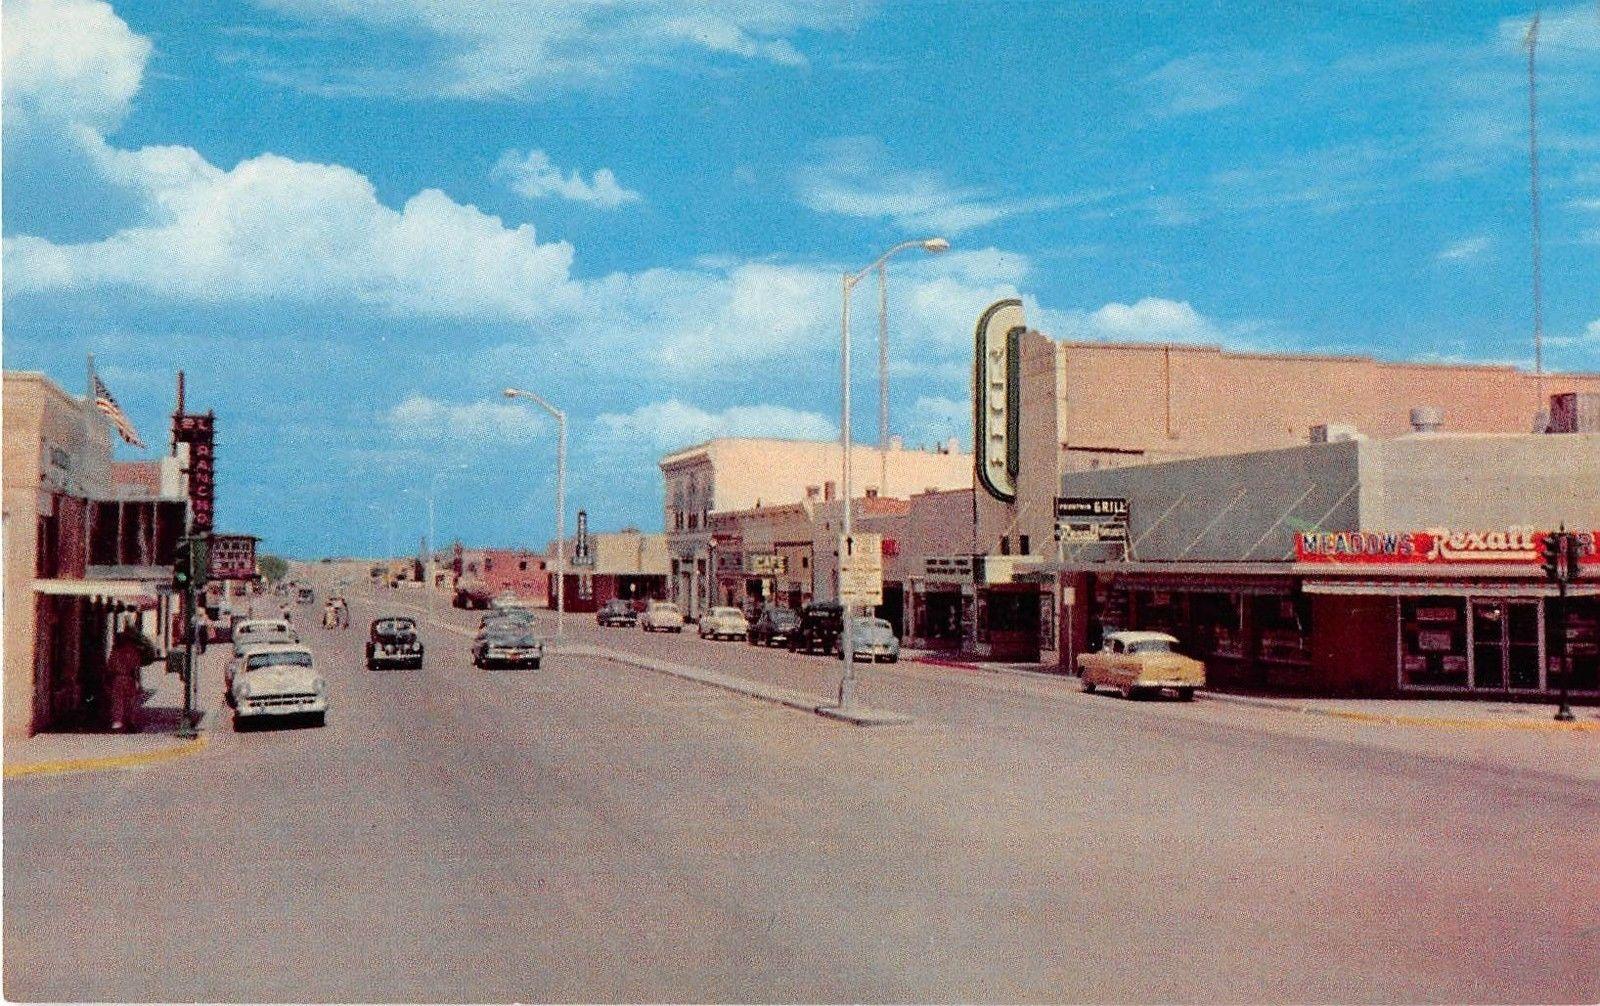 Meadows Rexall Drug Store Deming New Mexico 1954 linen